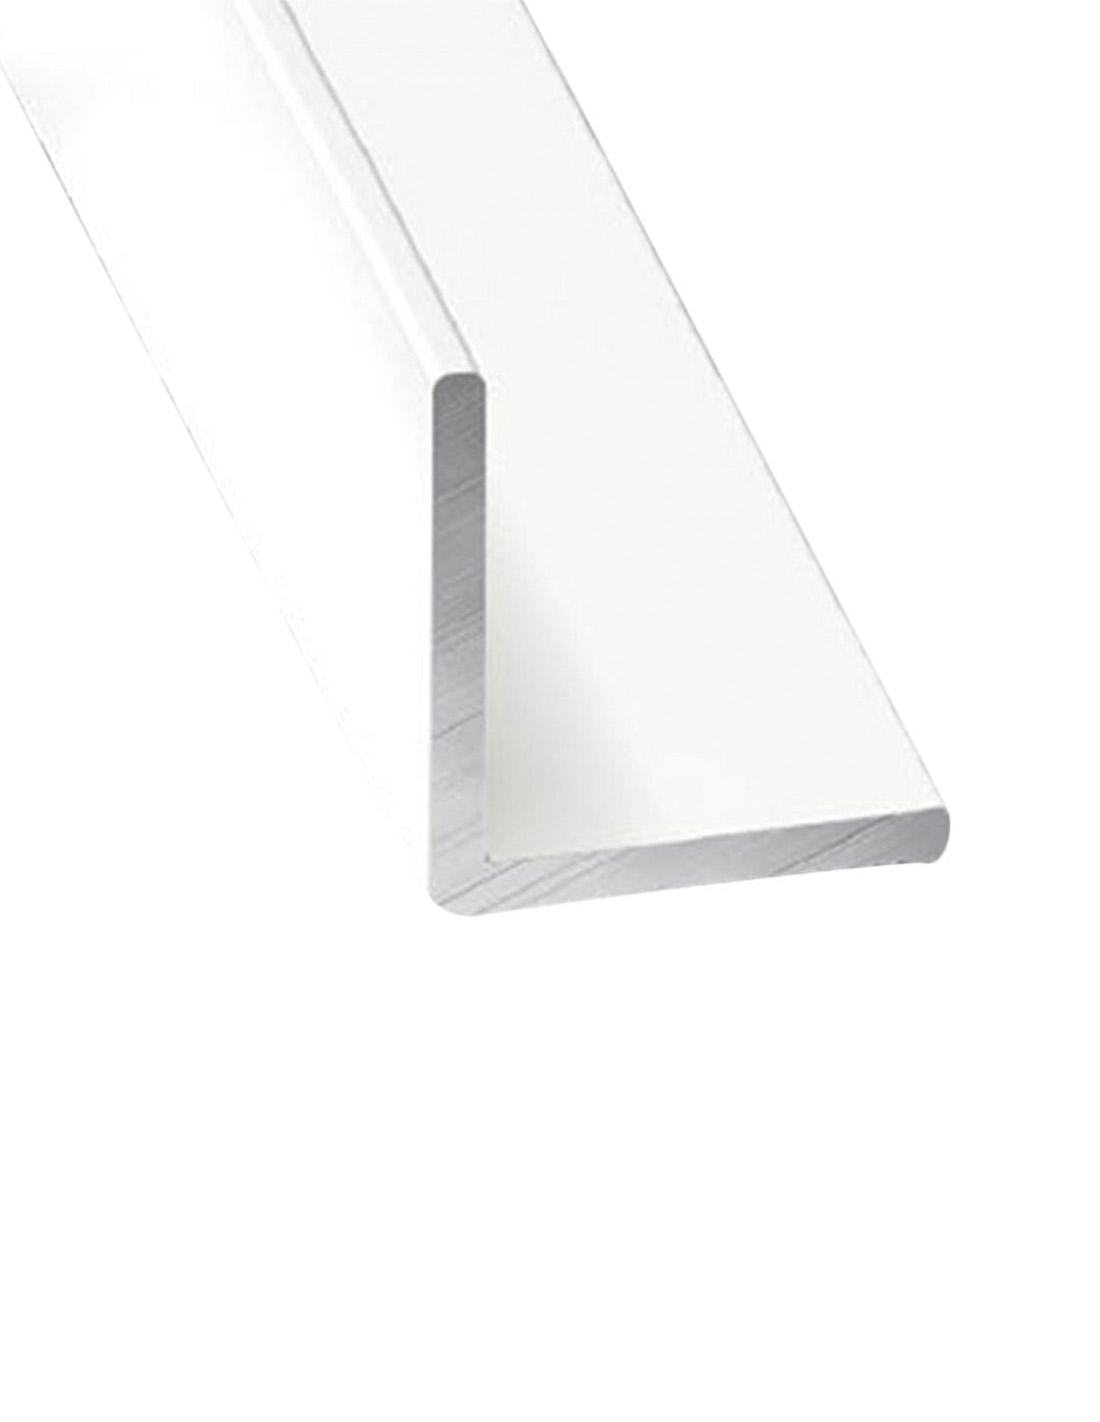 Tubo Cuadrado 210m x3 unds Jardin202 25mm Perfil de Aluminio Blanco